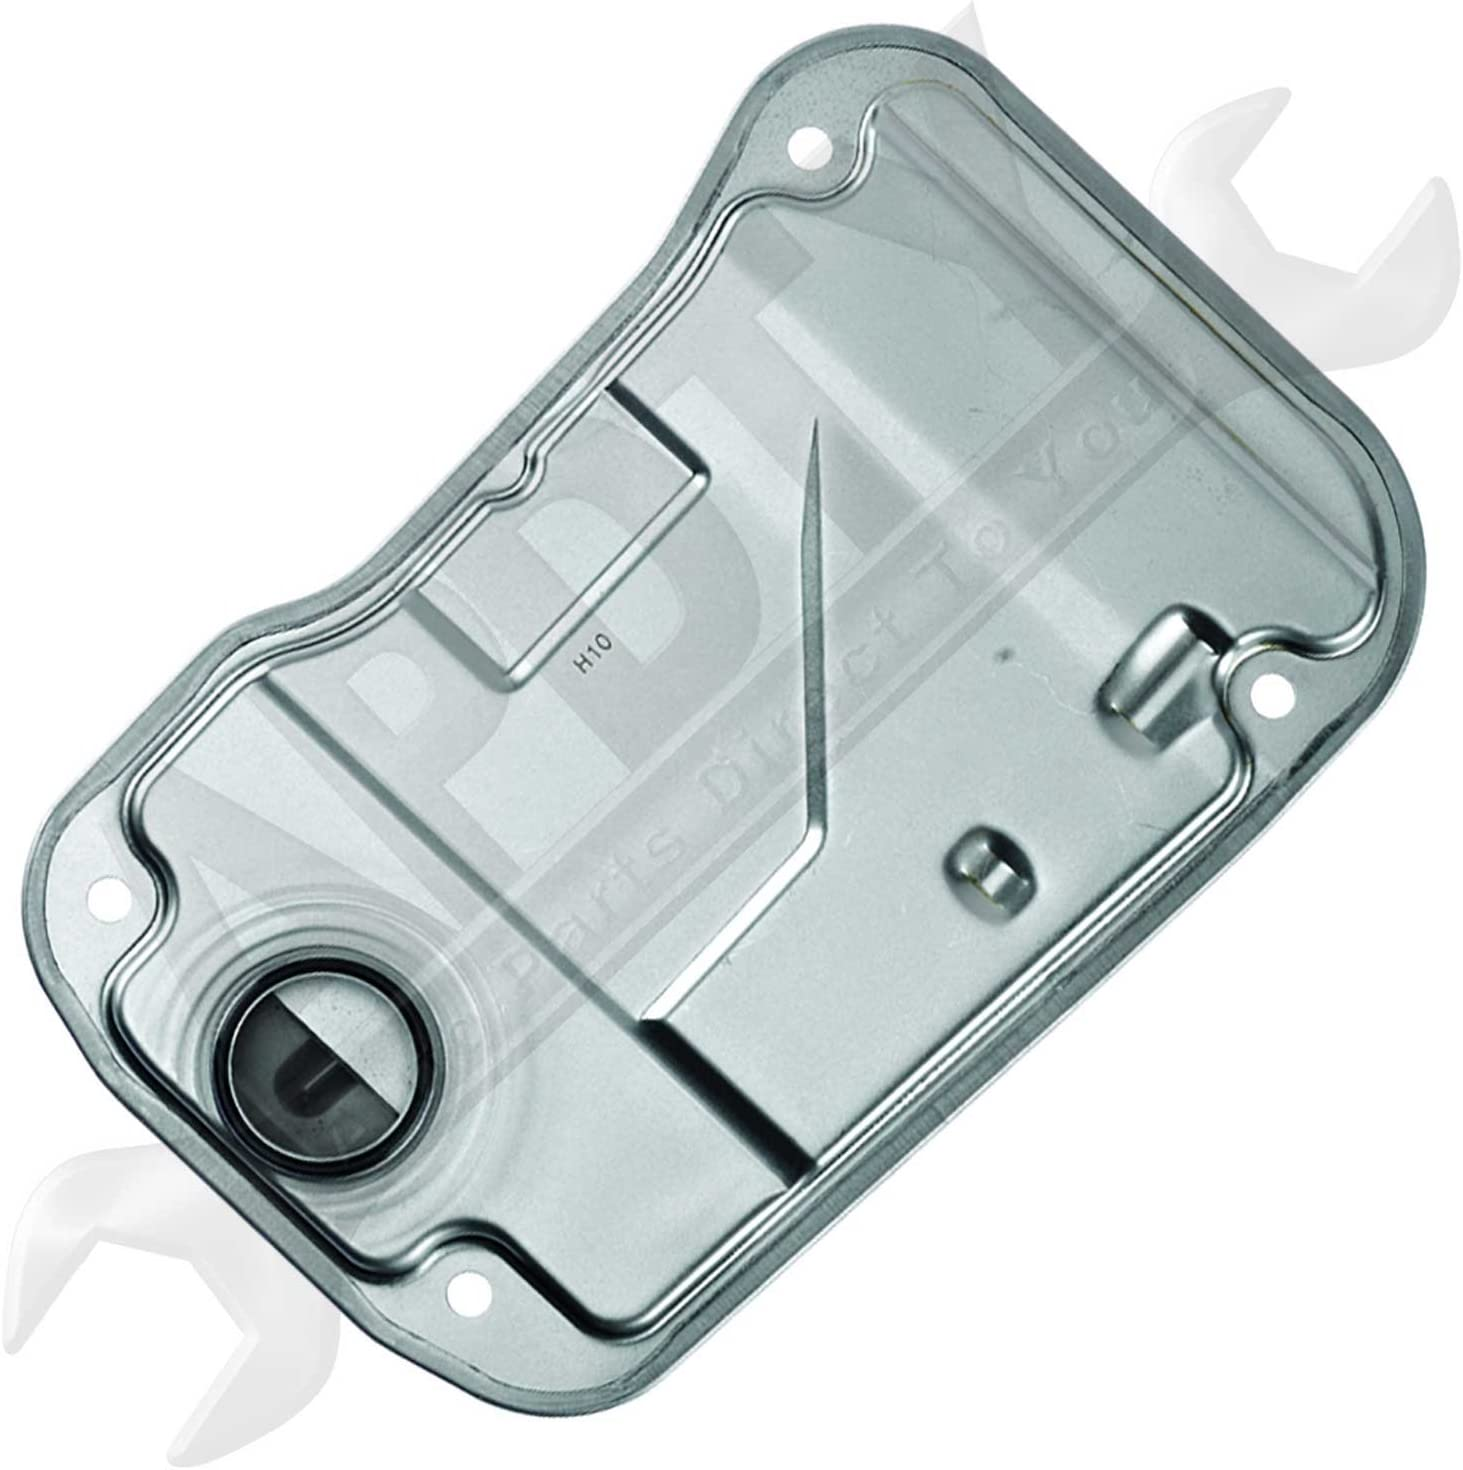 APDTY 100239 Automatic Transmission Filter Kit